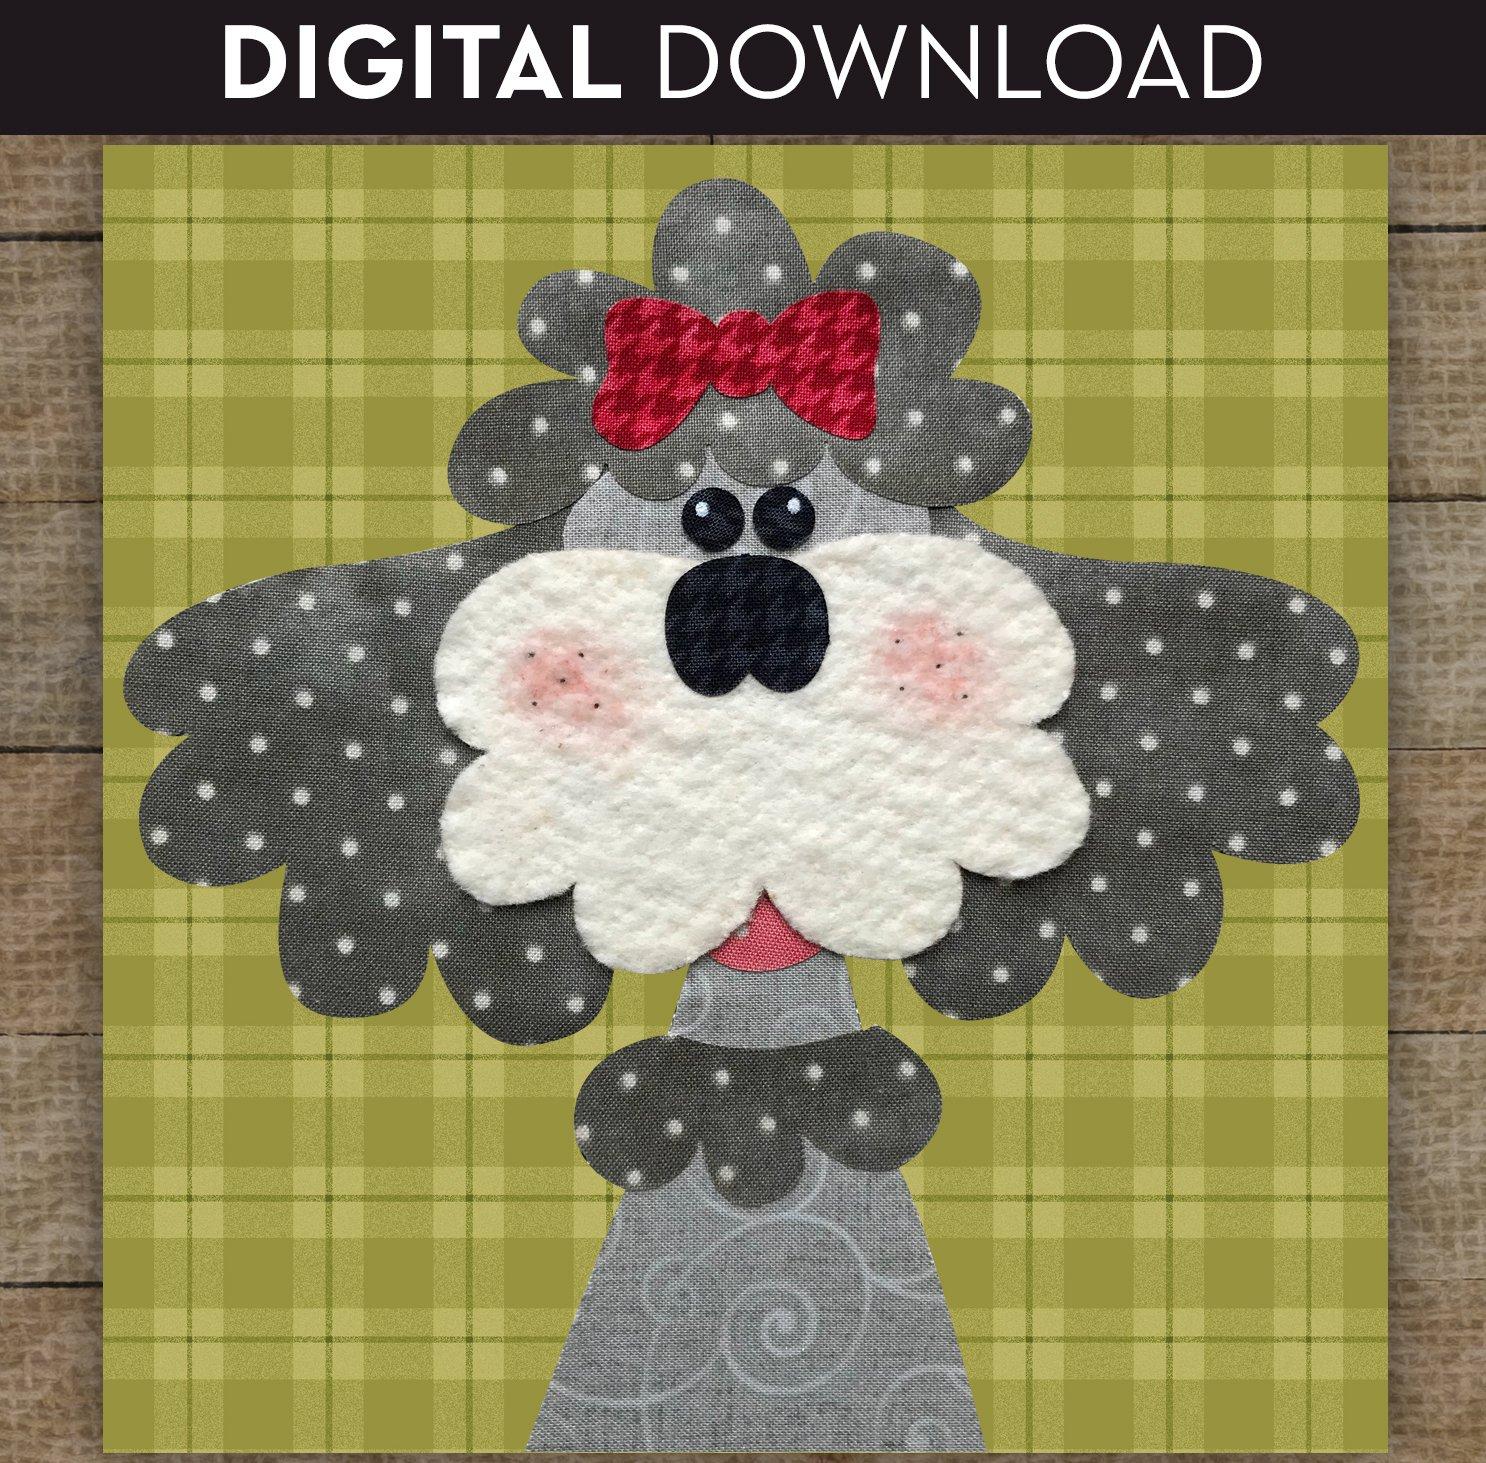 Poodle - Download